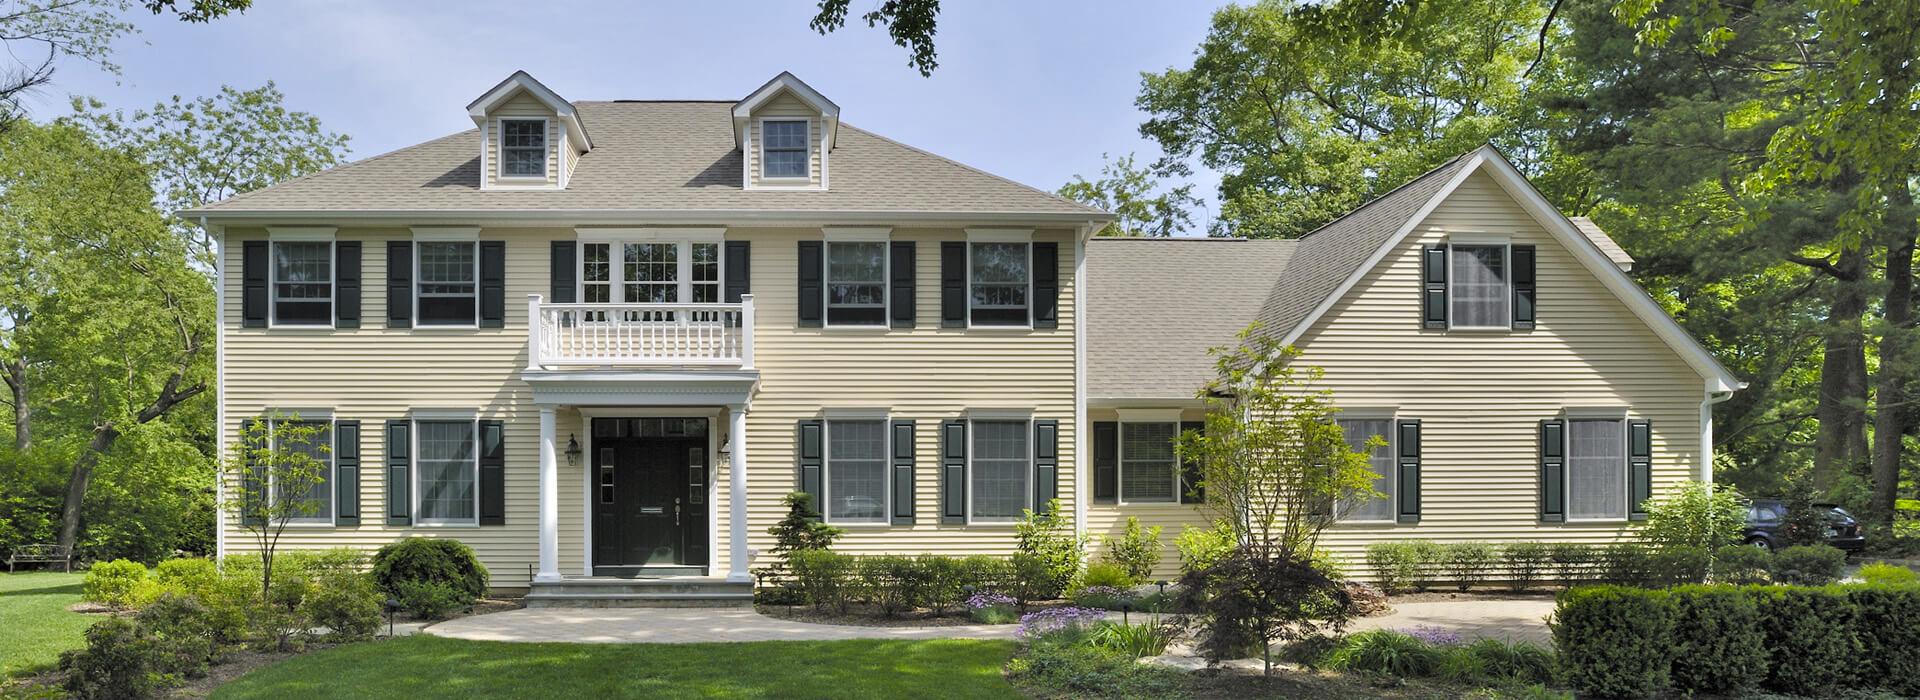 Shop New Modular Colonial Homes